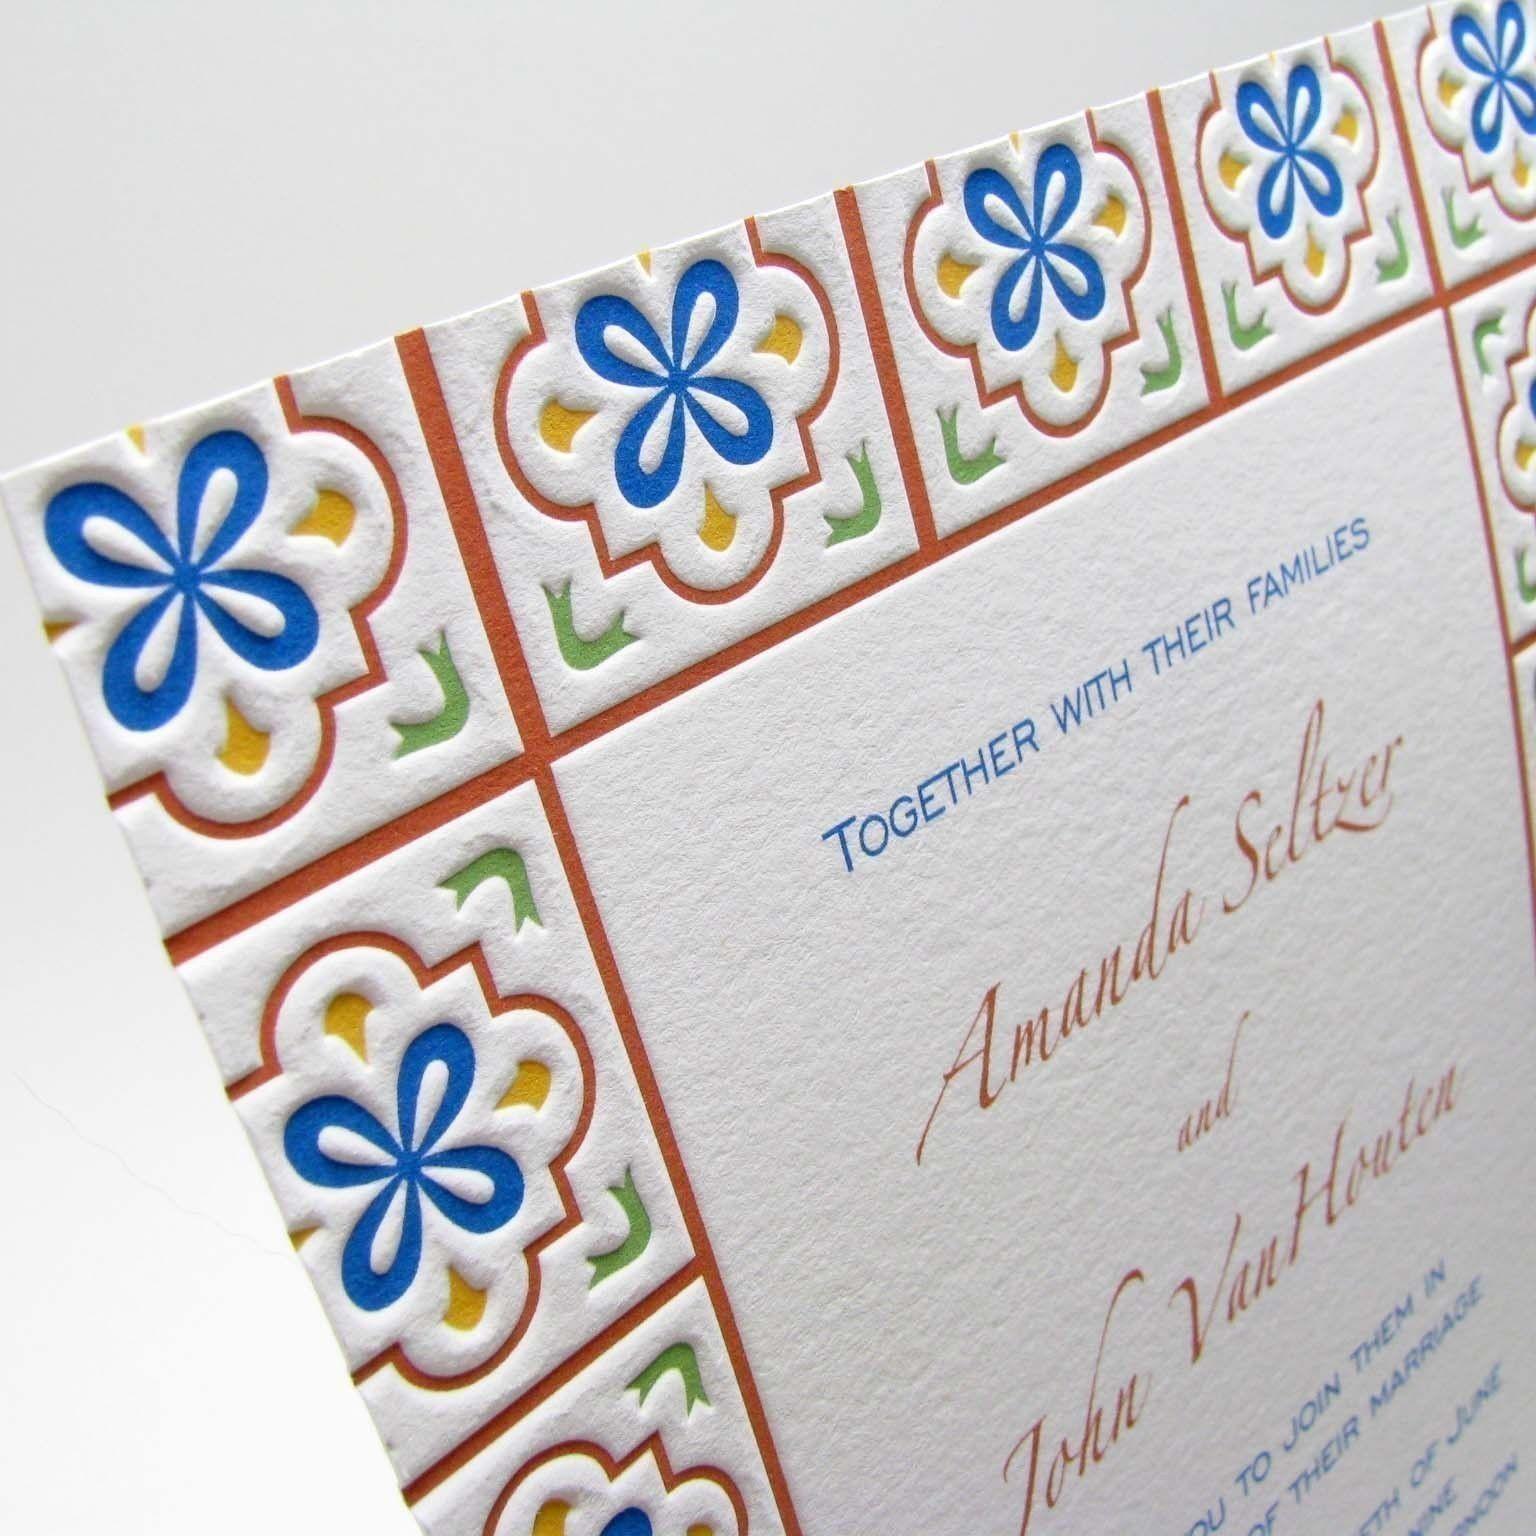 mexican wedding invitations   Wedding   Pinterest   Mexican ...